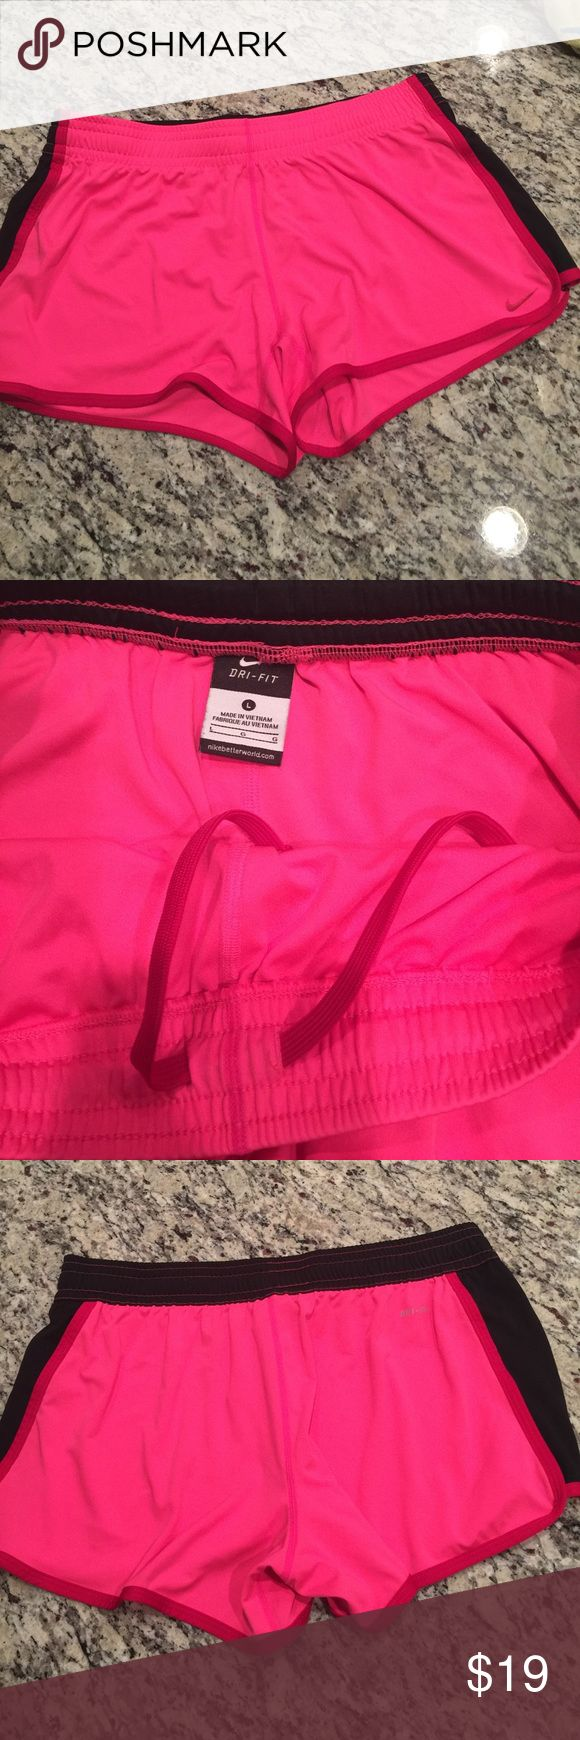 Nike dry fit shorts Super soft and comfy Nike dri fit shorts. Drawstring waist. Good used condition Nike Shorts Skorts